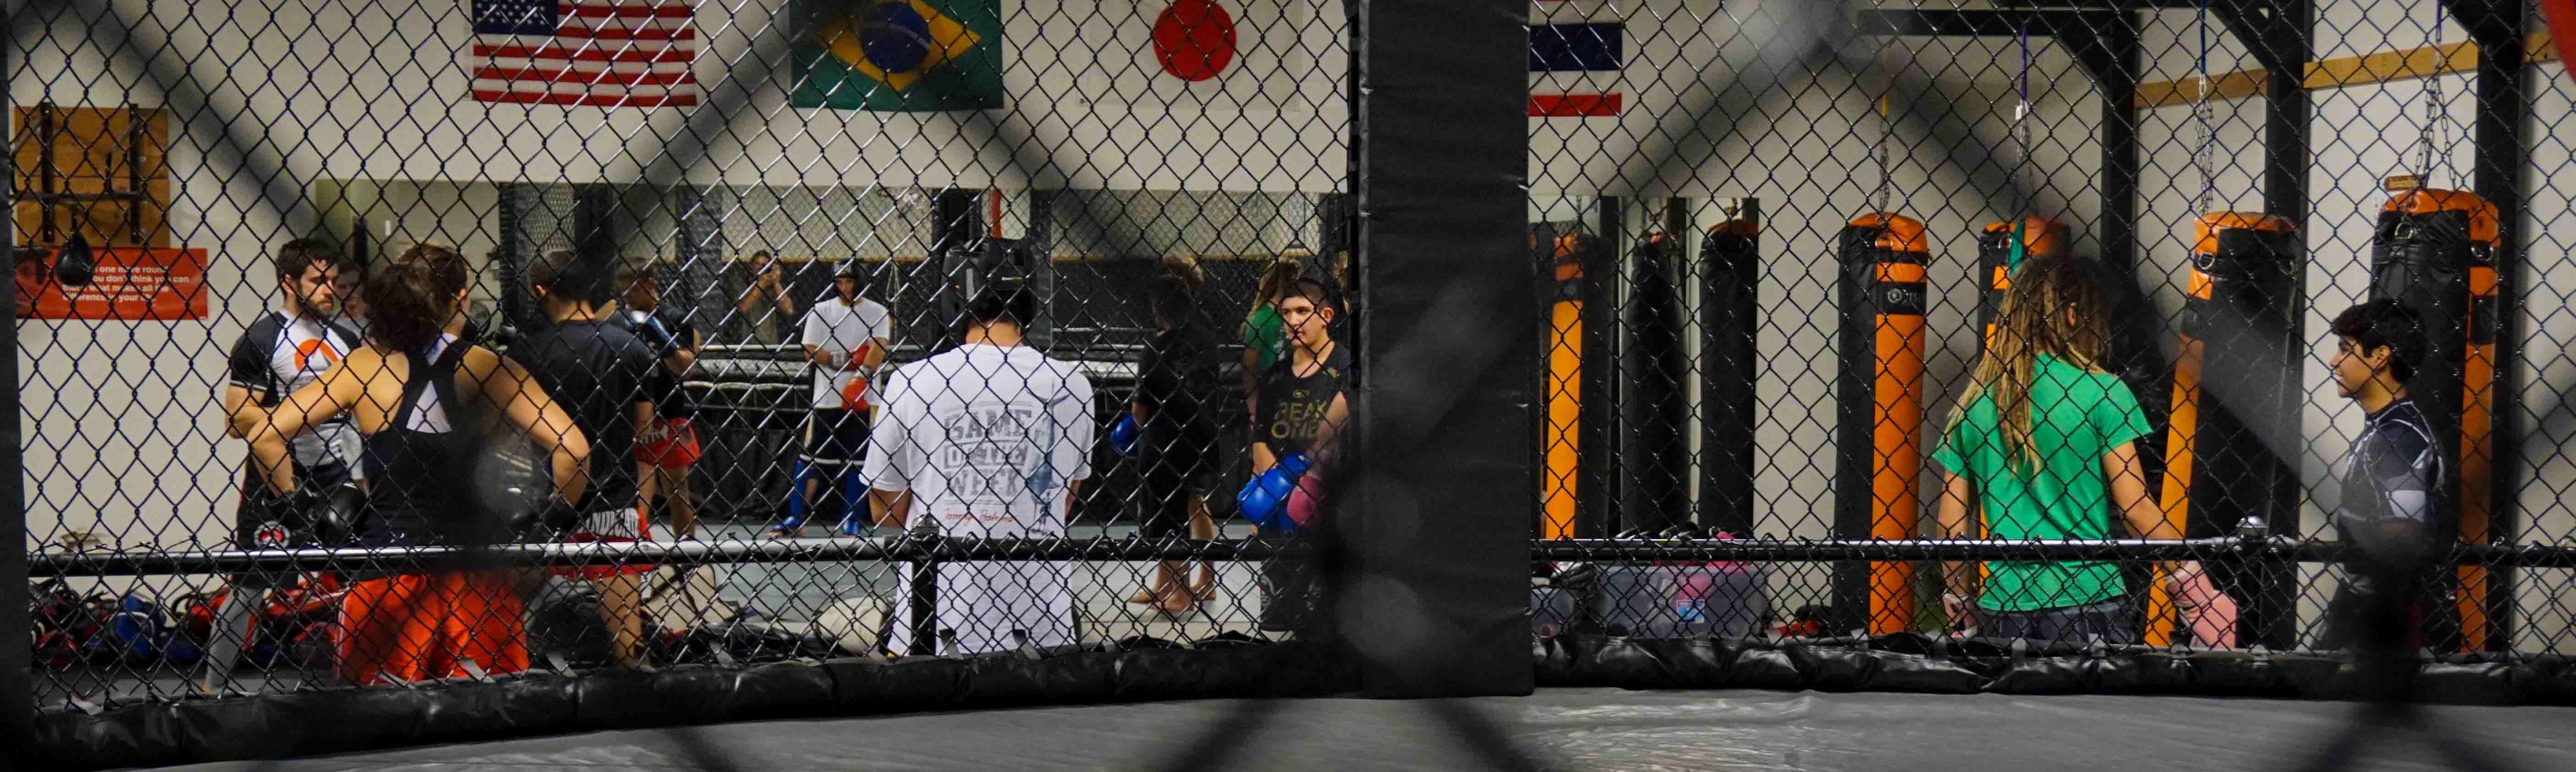 Durango Martial Arts Academy Muay Thai Kickboxing